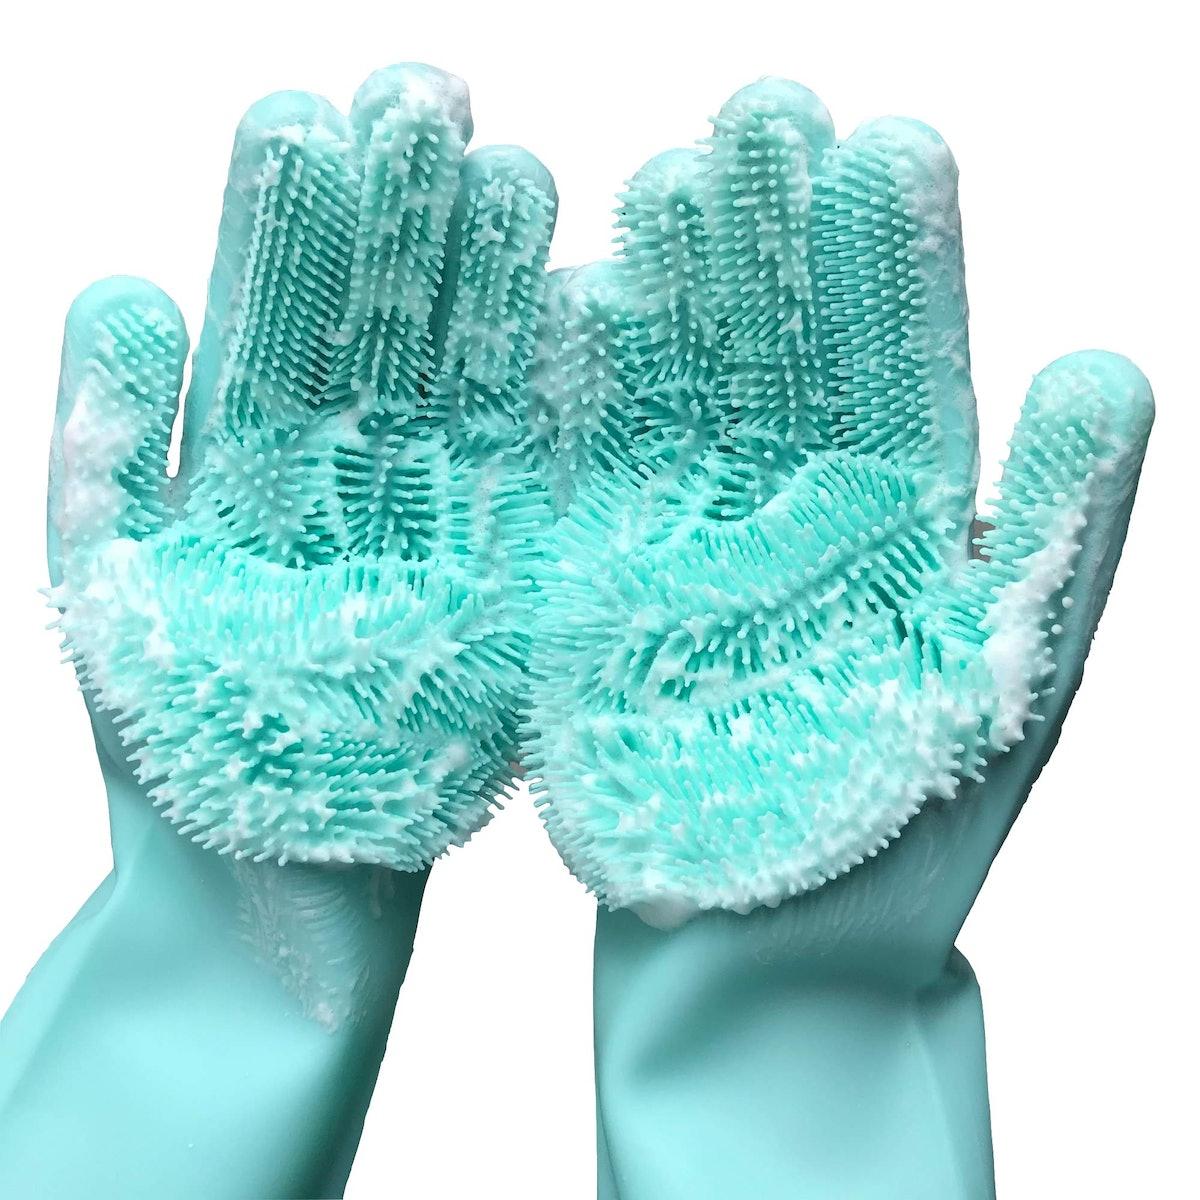 MITALOO Dishwashing Gloves